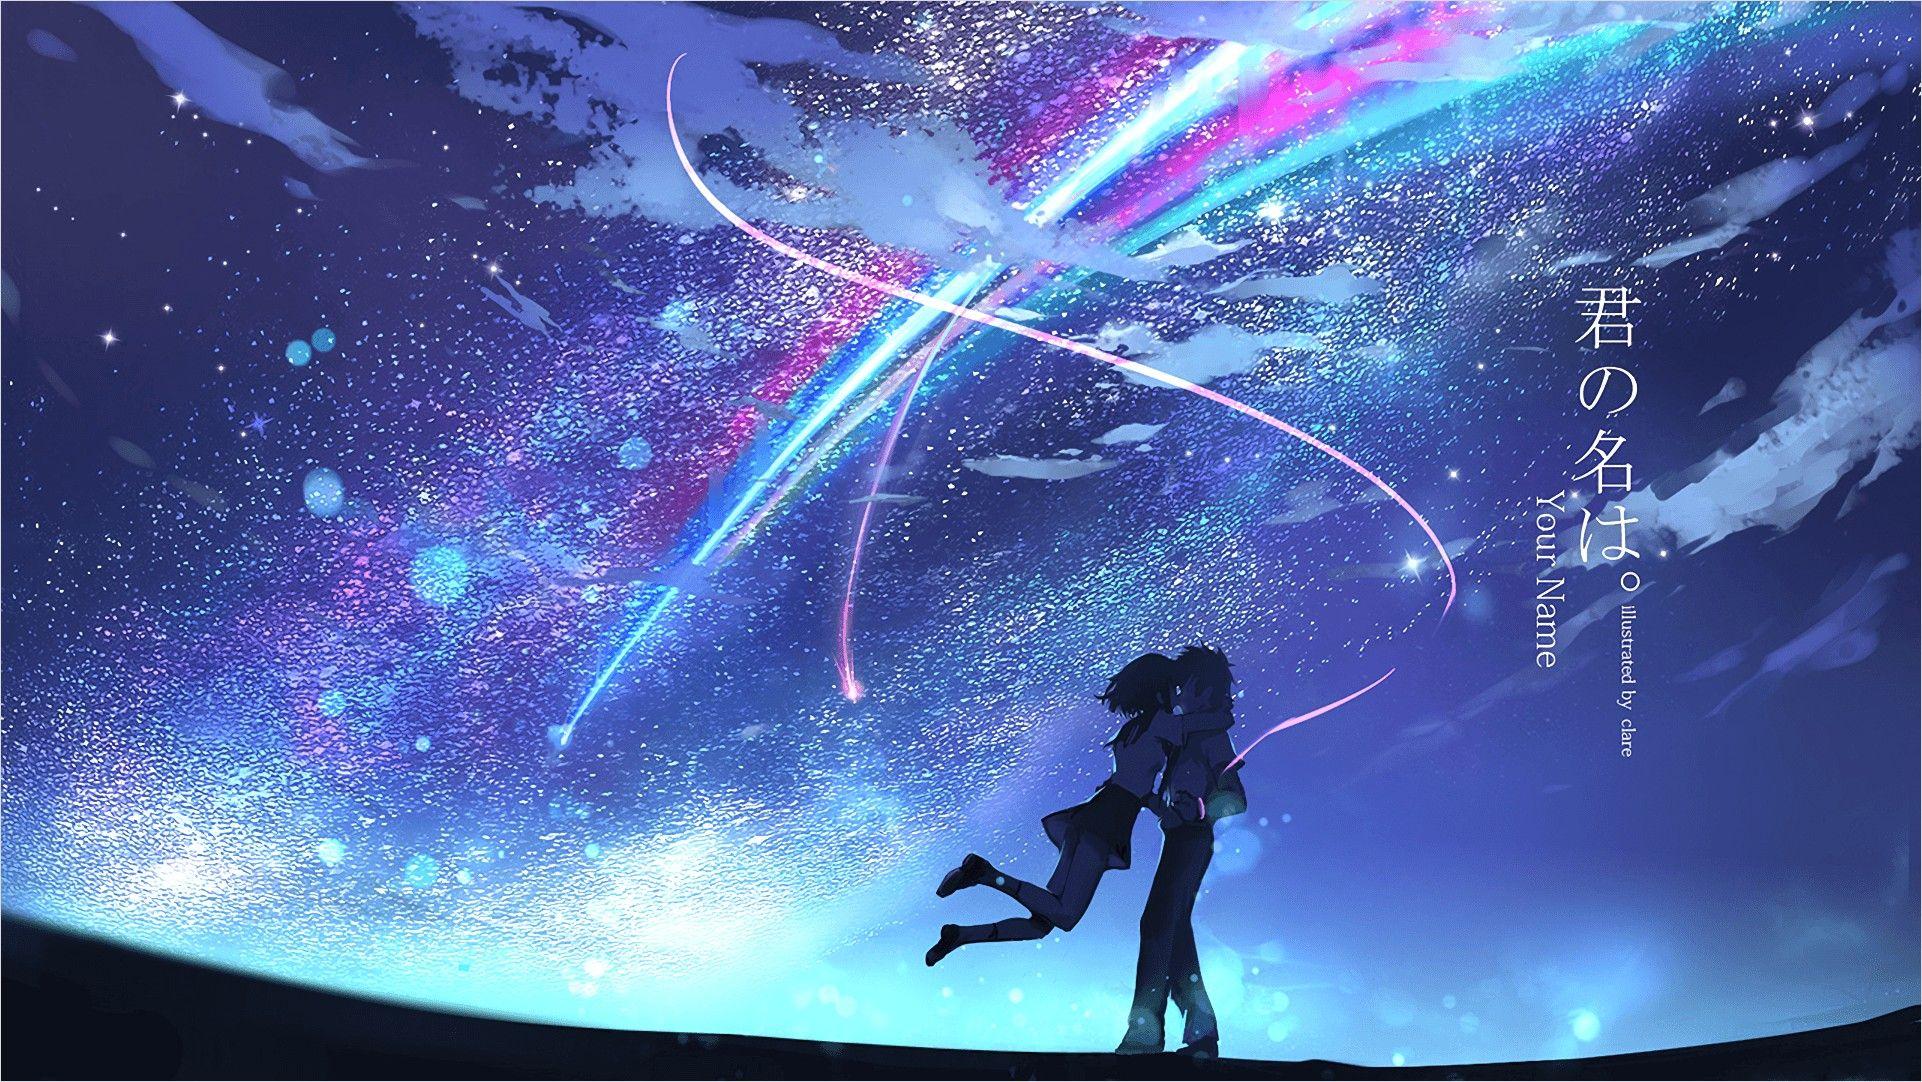 4k Anime With Name Wallpaper in 2020 Kimi no na wa